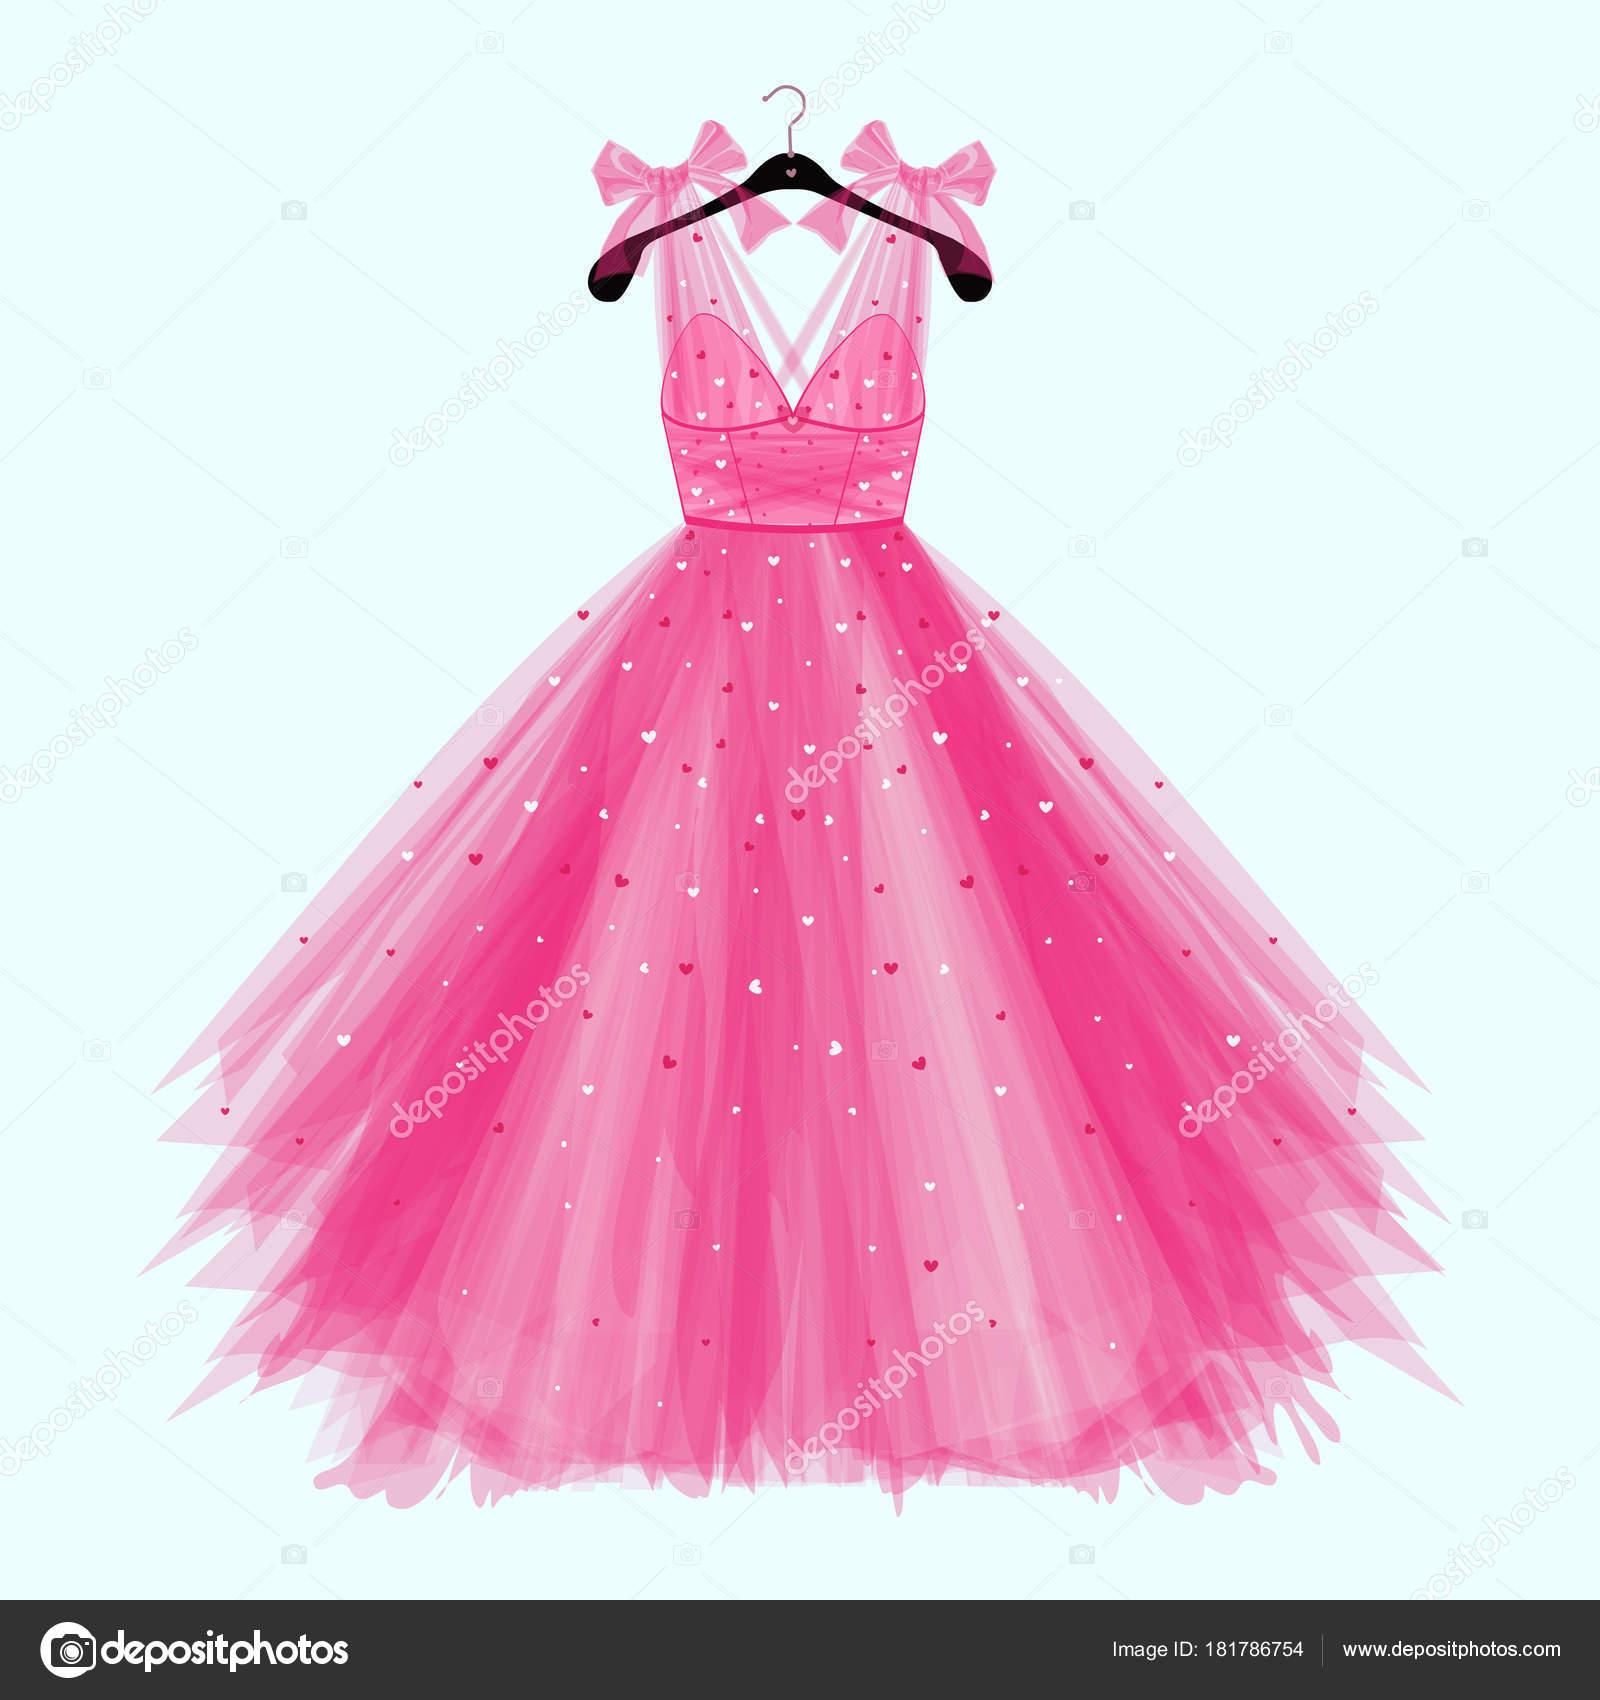 Pink birthday party dress bow fashion illustration invitation card pink birthday party dress bow fashion illustration invitation card stock vector stopboris Images